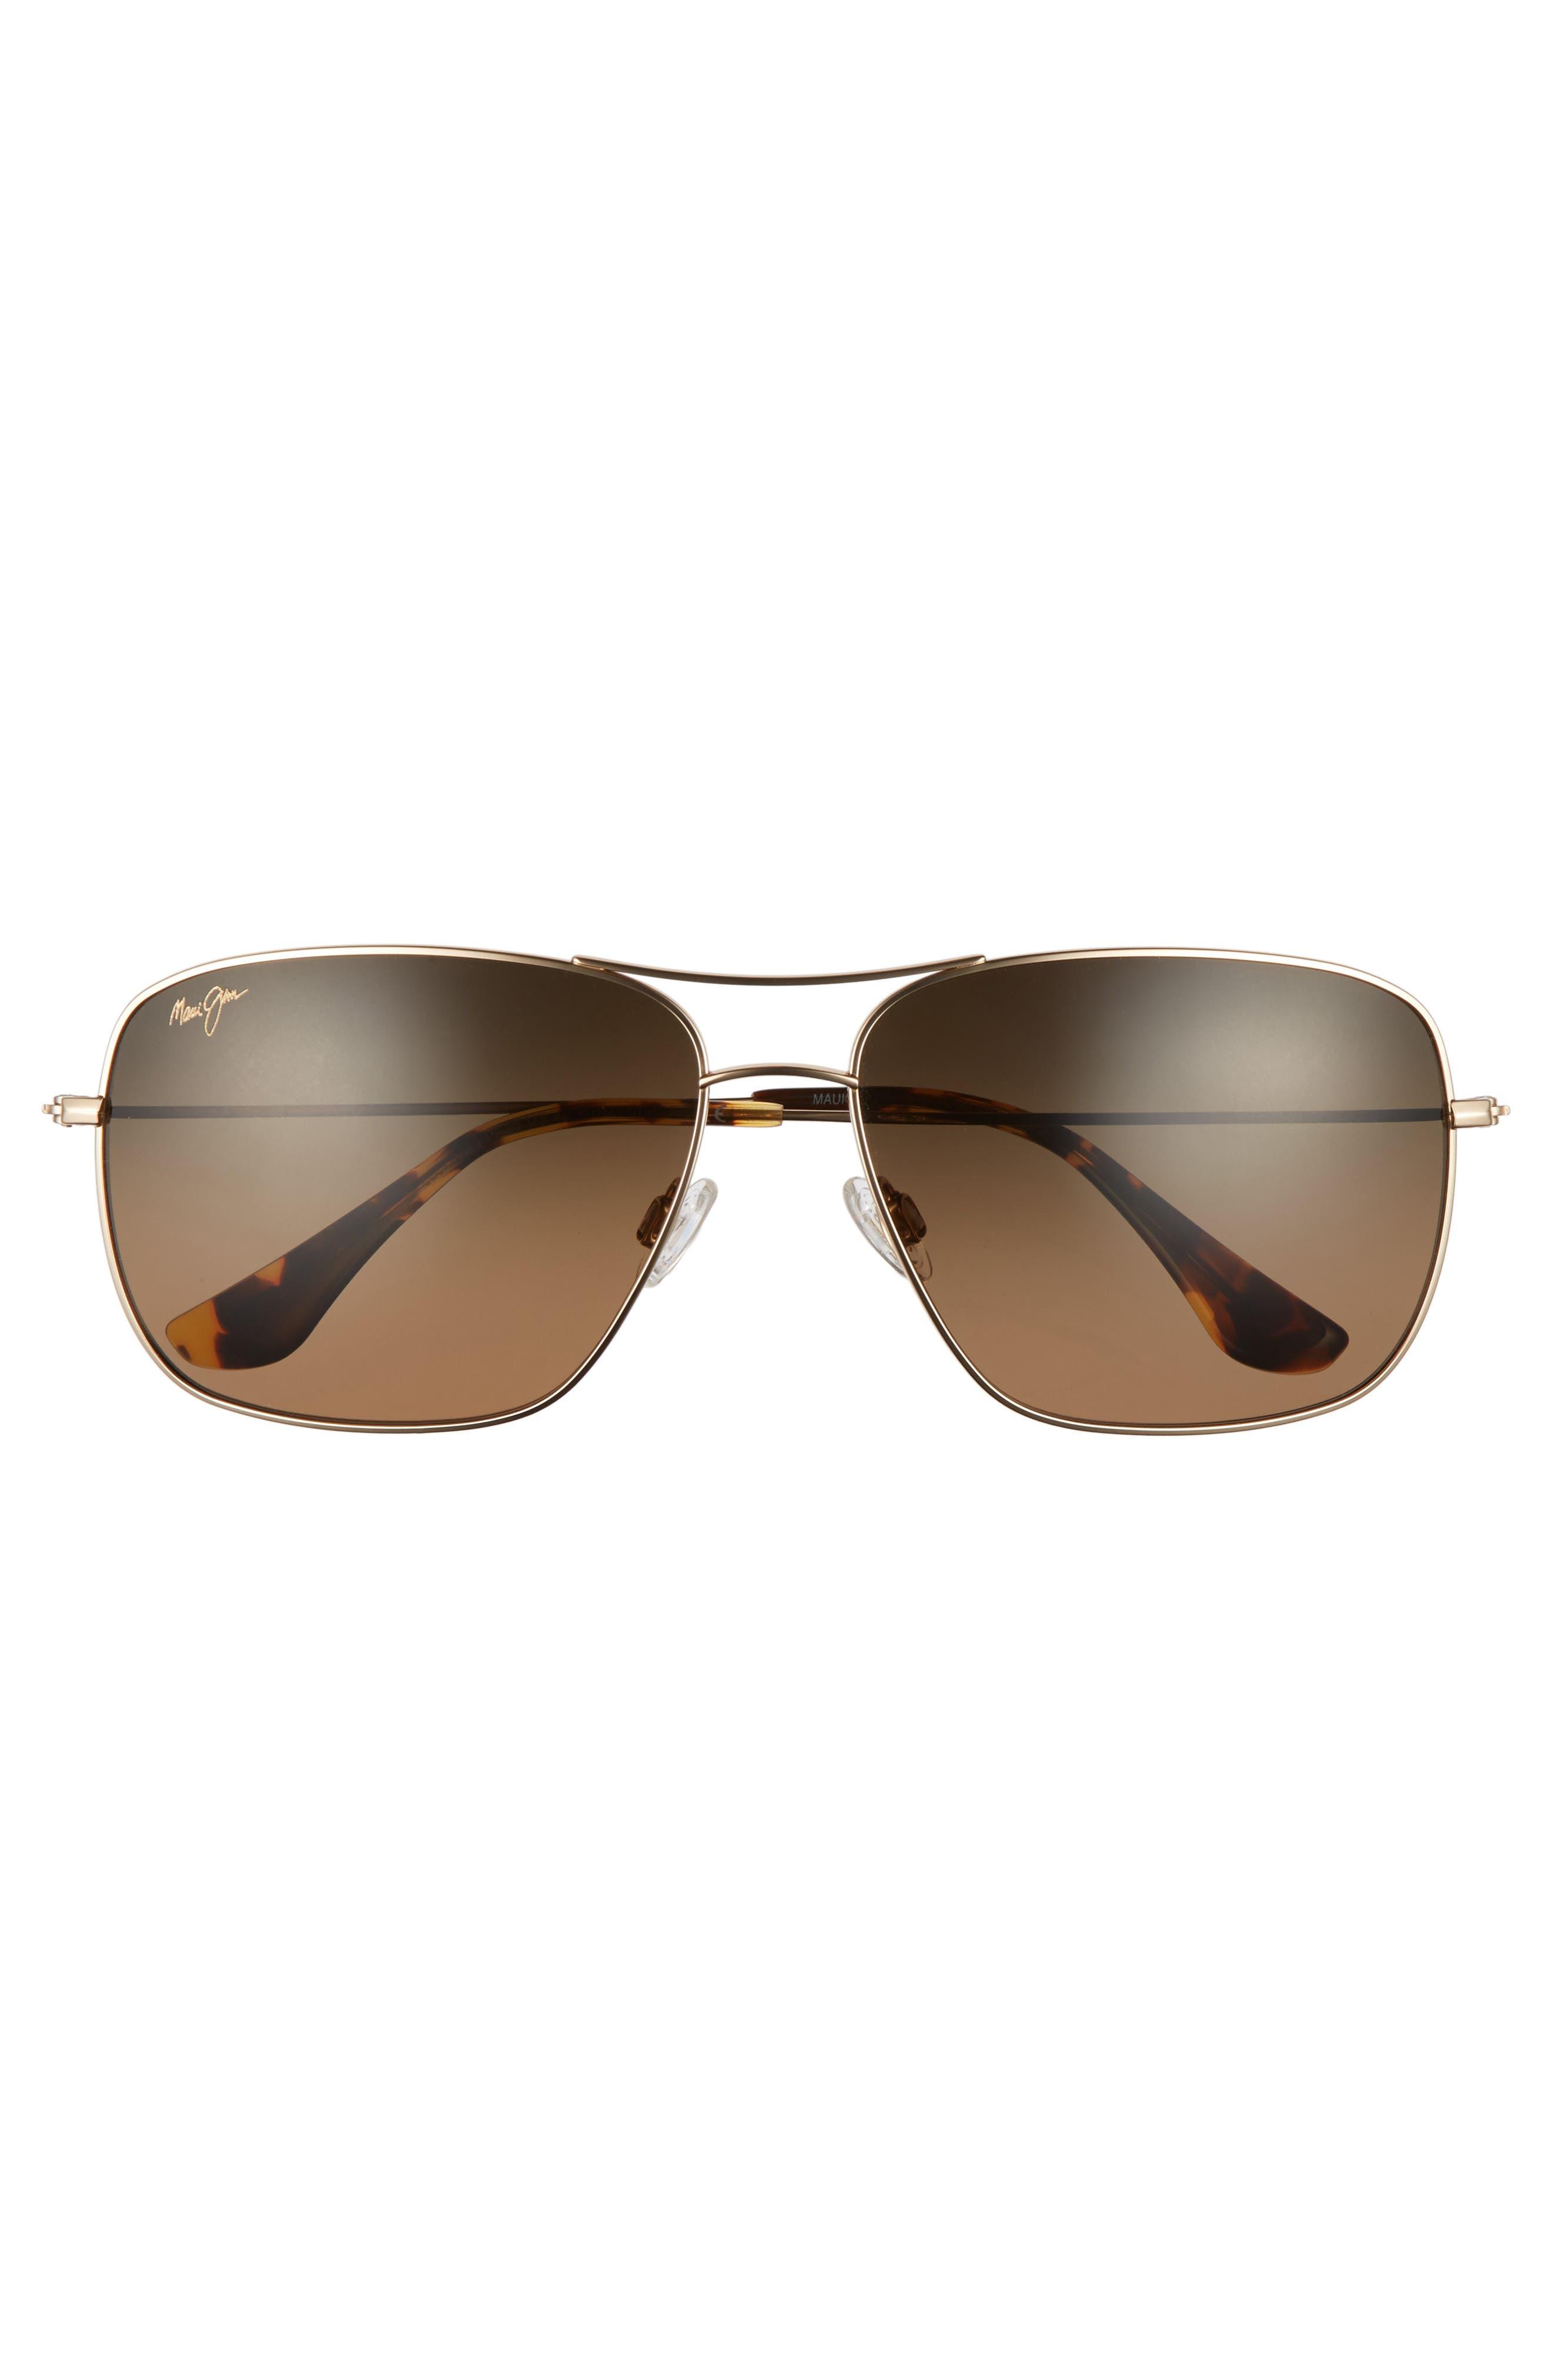 Cook Pines 63mm Polarized Titanium Aviator Sunglasses,                             Alternate thumbnail 12, color,